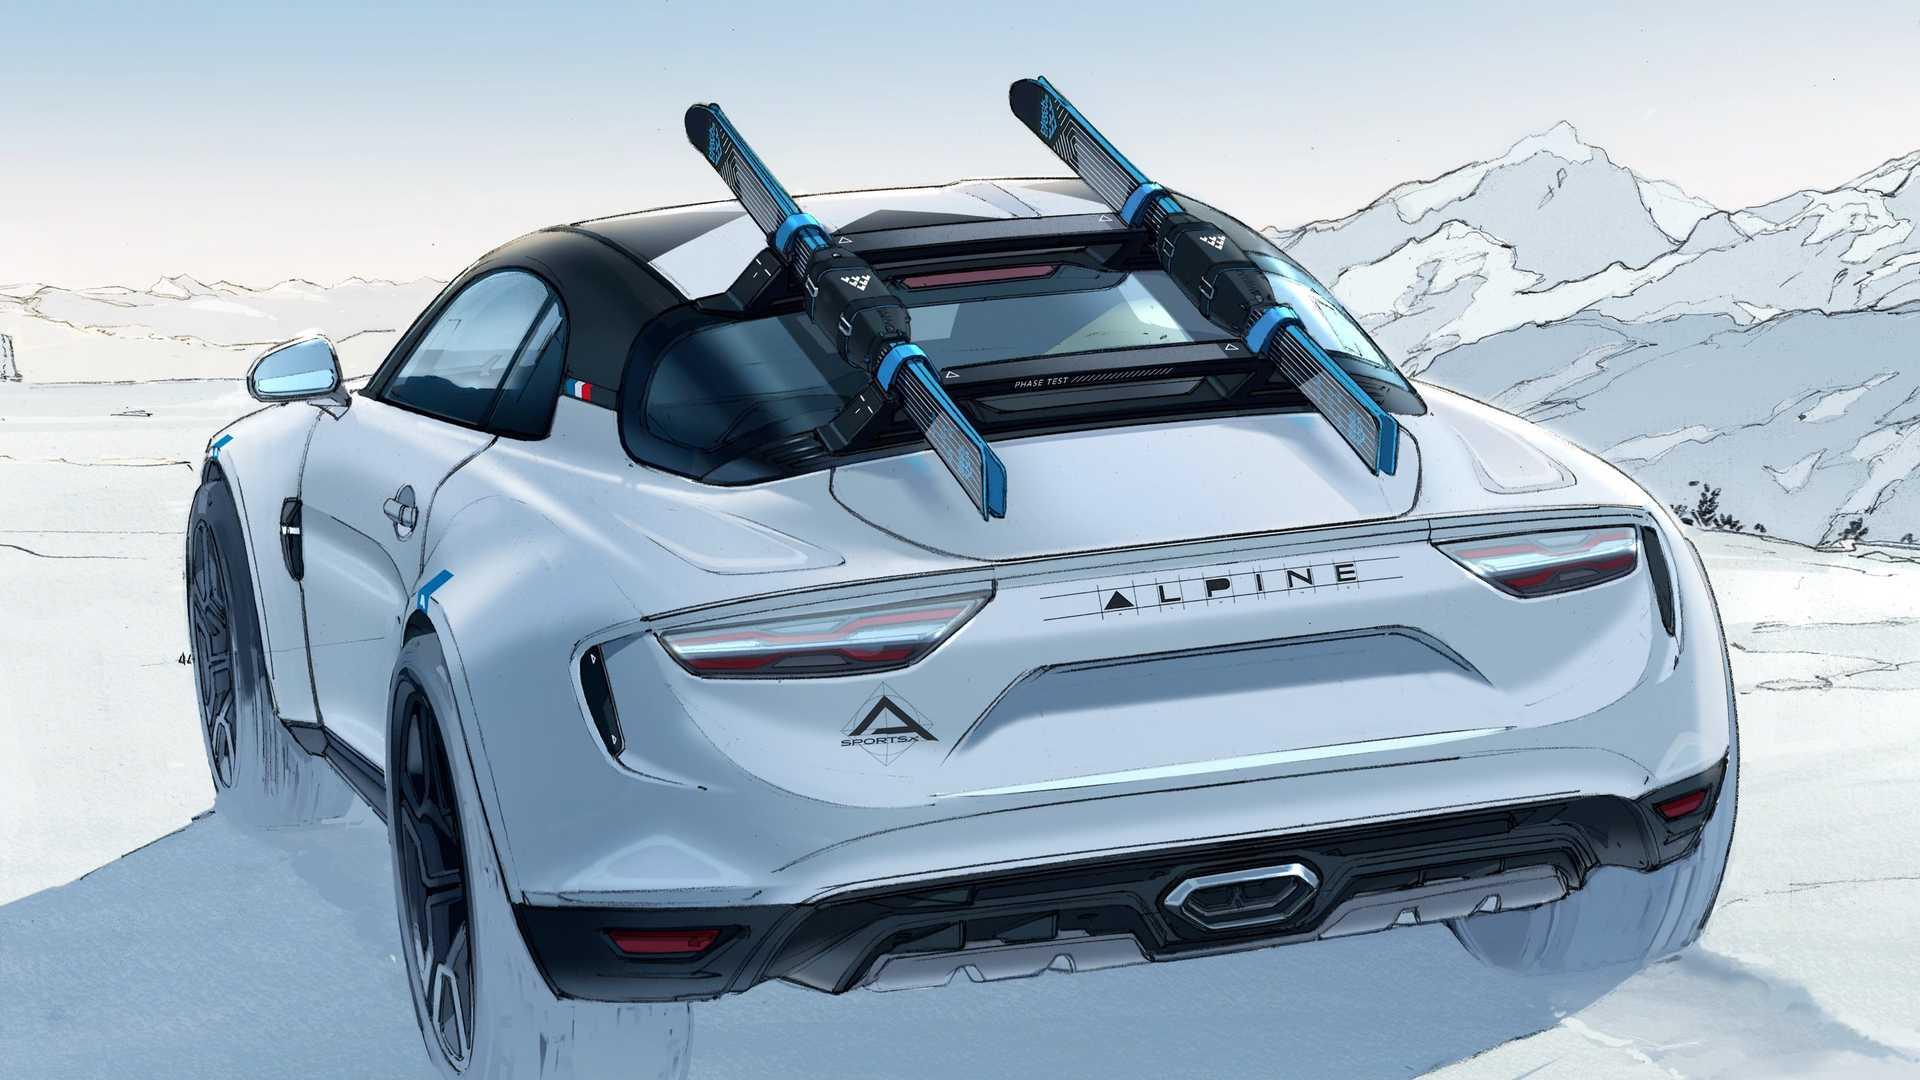 alpine-a110-sportsx-9